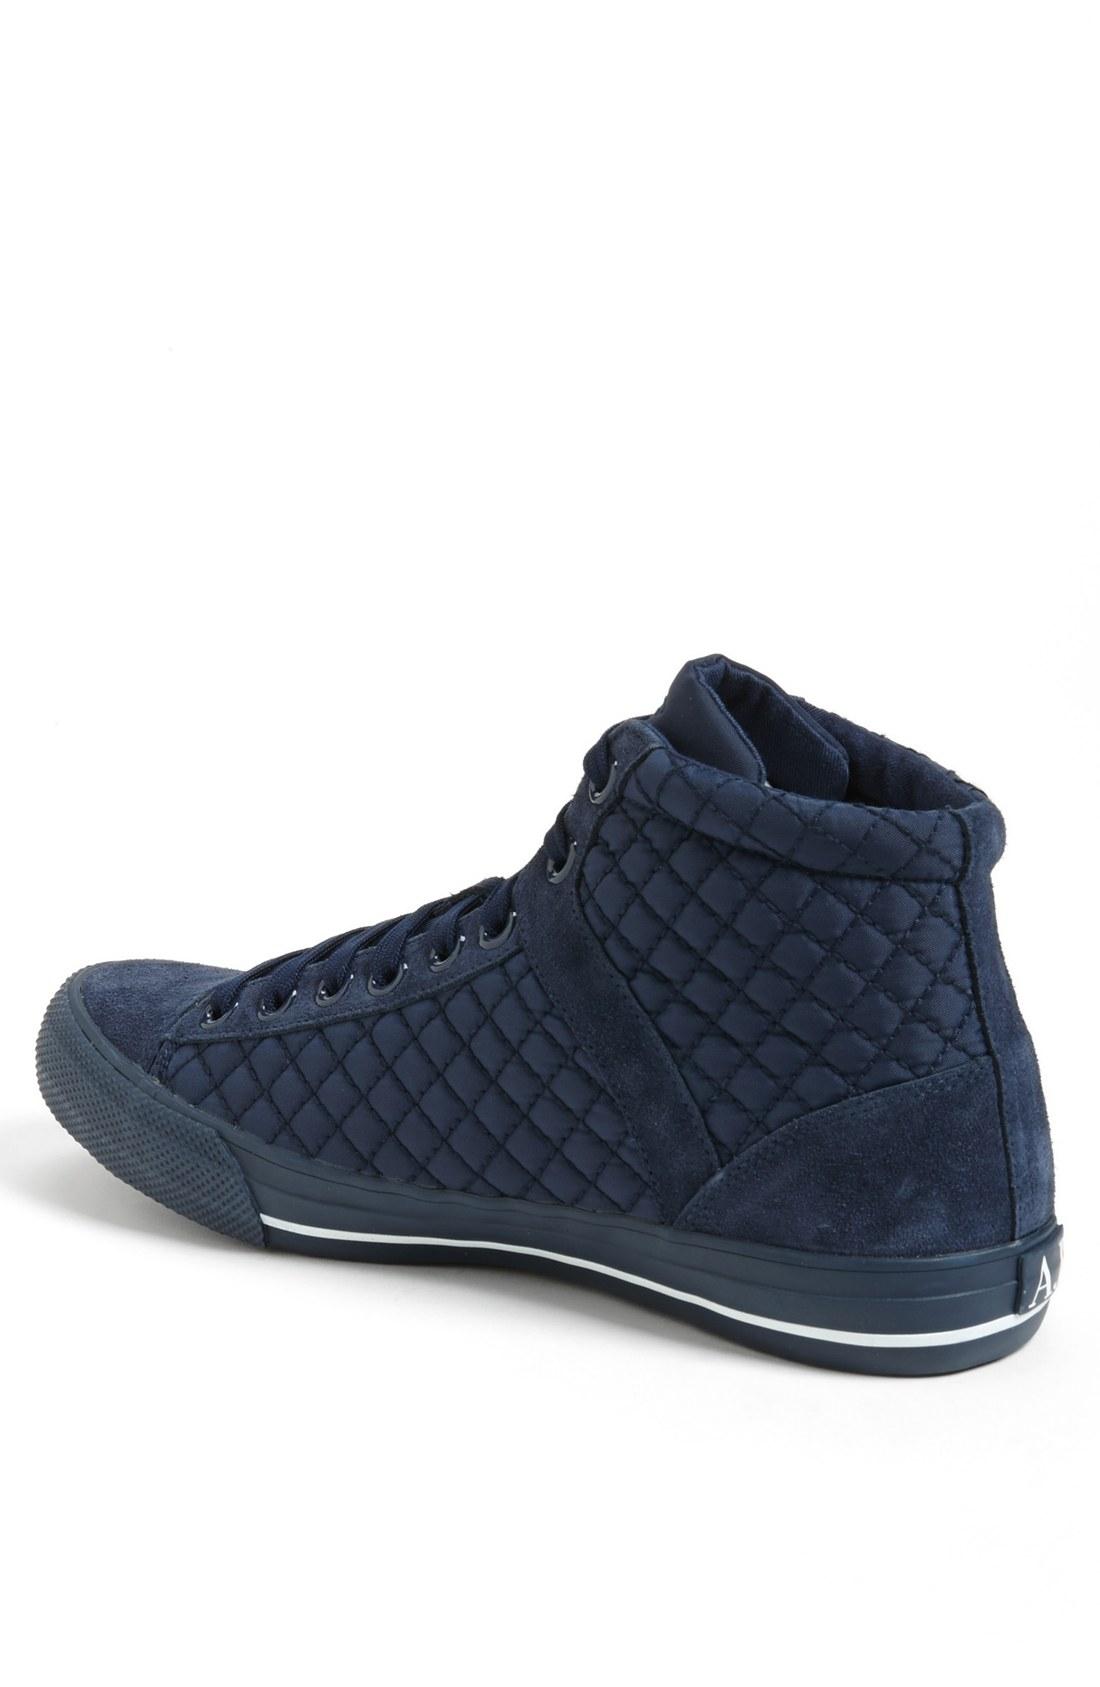 armani jeans quilted sneaker in black for men navy lyst. Black Bedroom Furniture Sets. Home Design Ideas